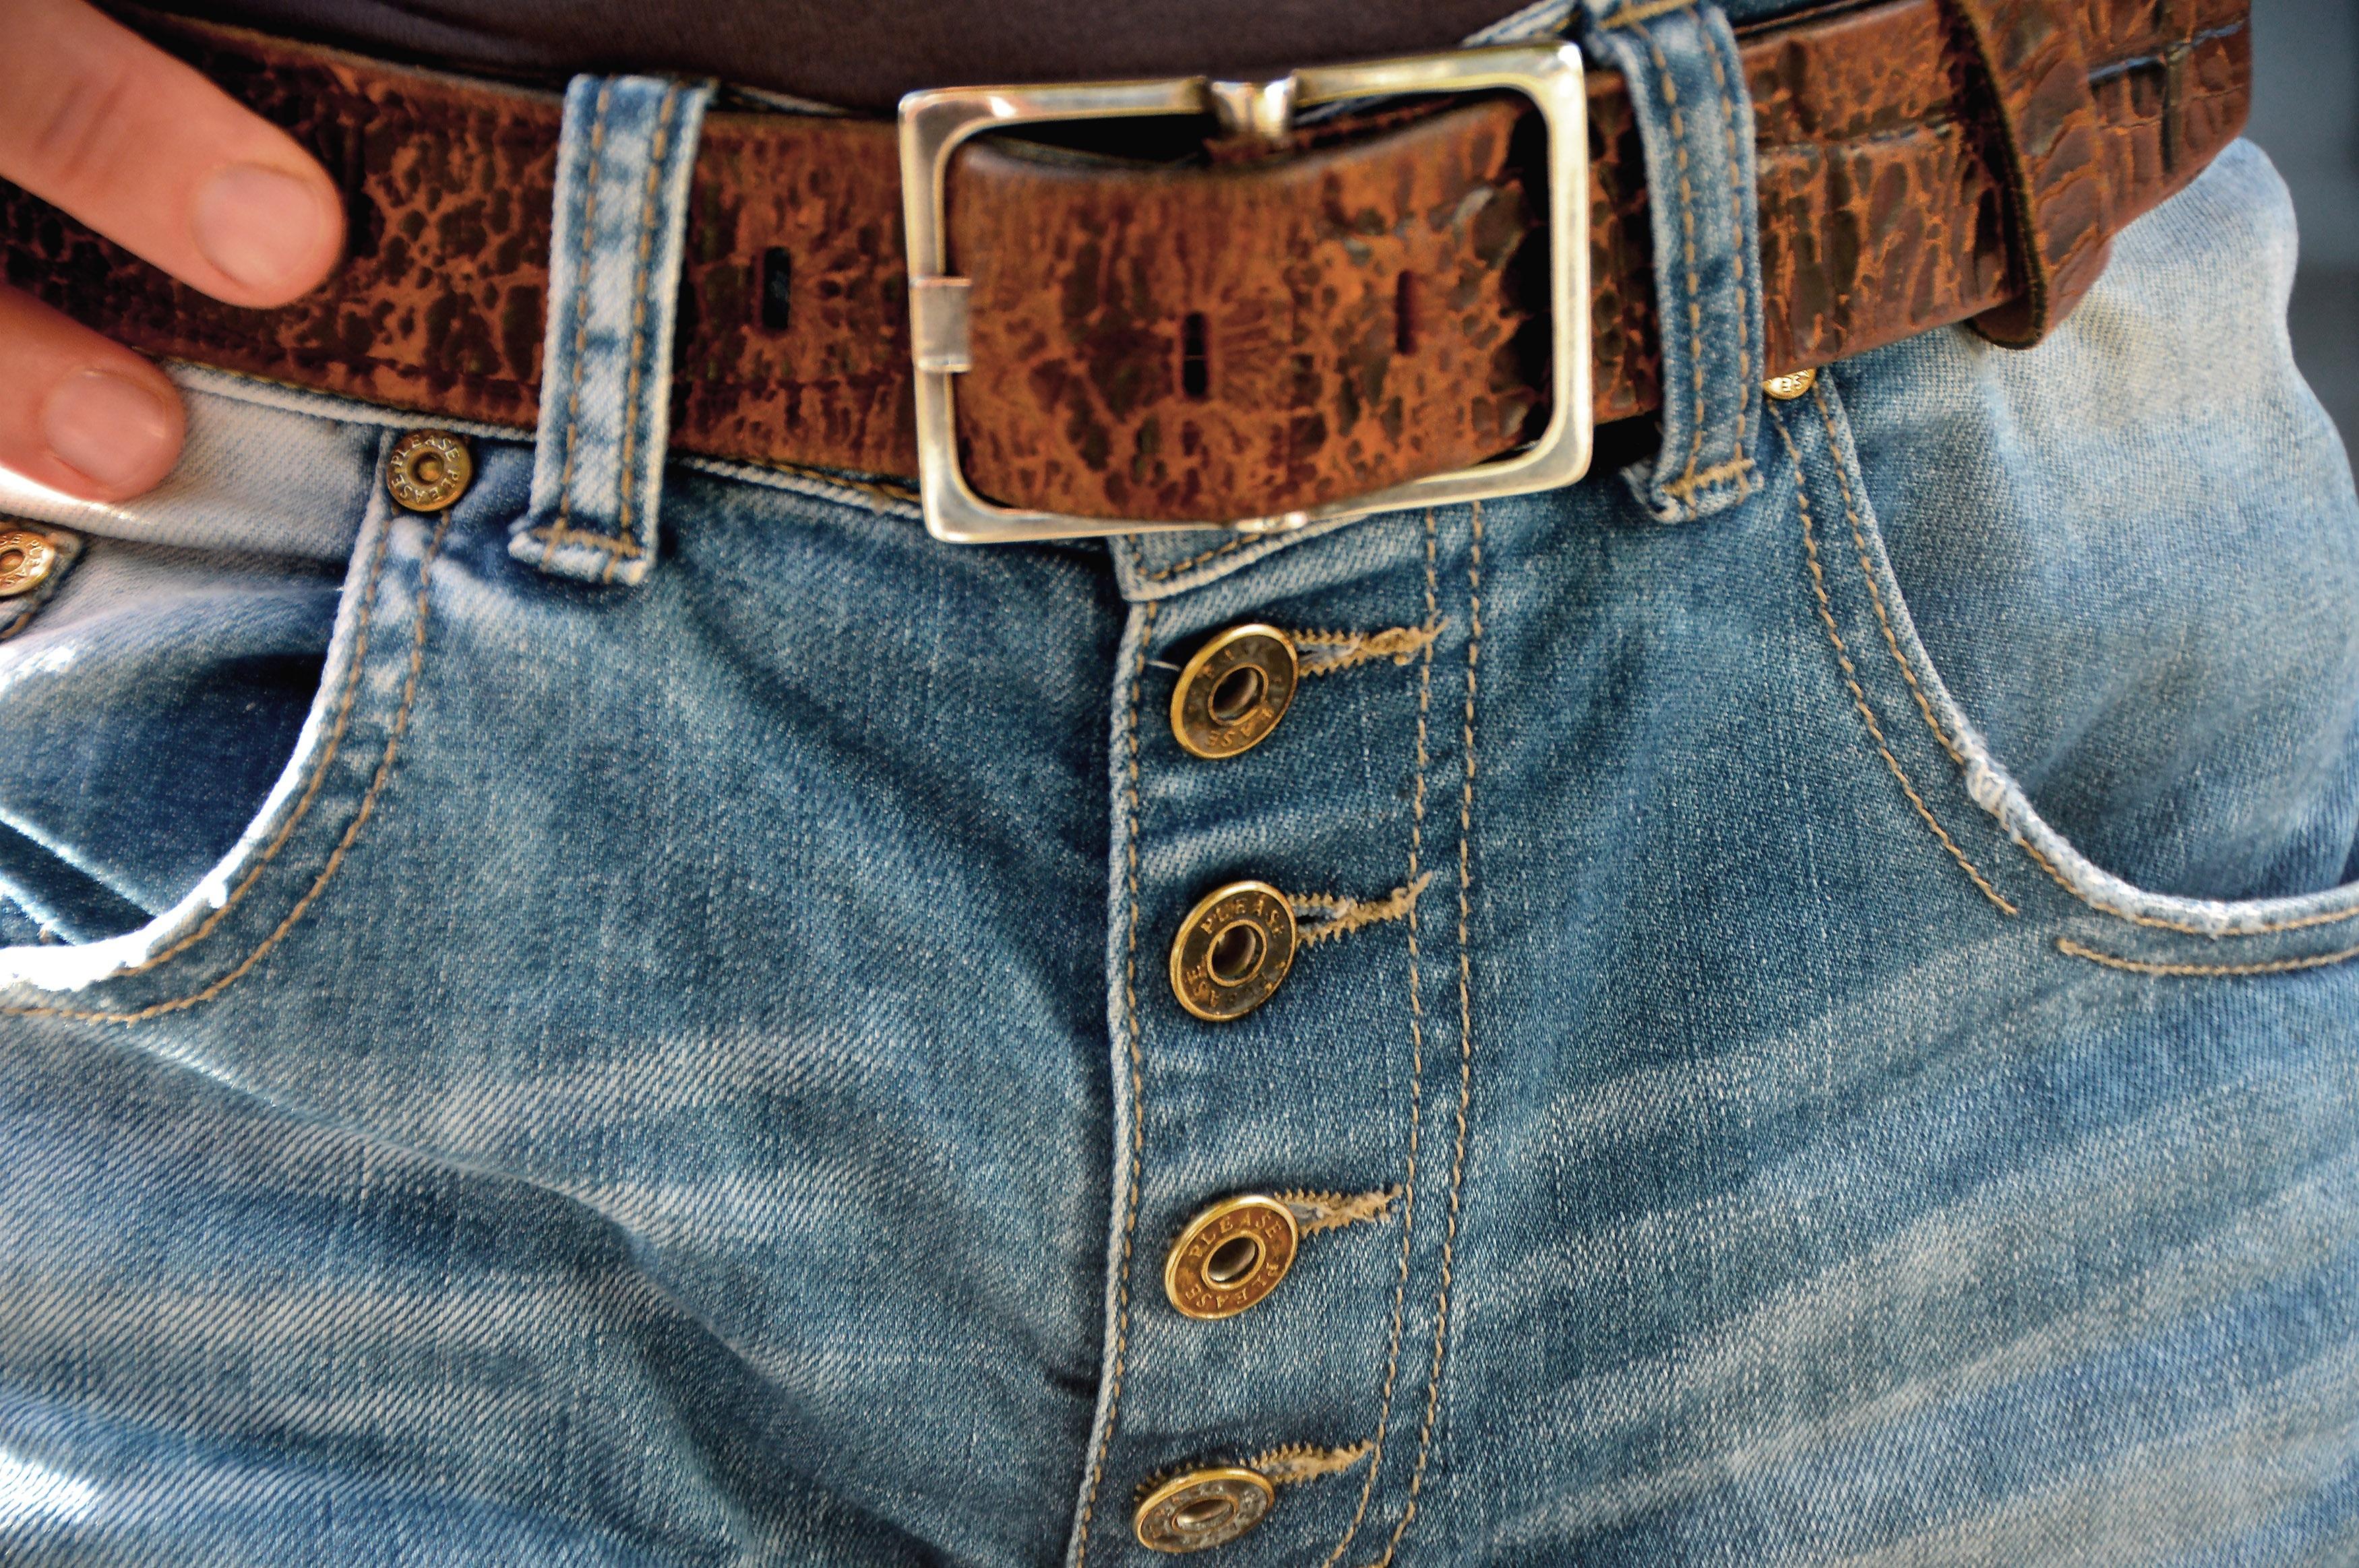 c024252b Bildet : lær, mønster, metall, bag, mote, klær, materiale, denim, bukser,  belte, tekstil, messing, stil, knapper, lomme, glidelås, Demin, spenne,  søm, ...